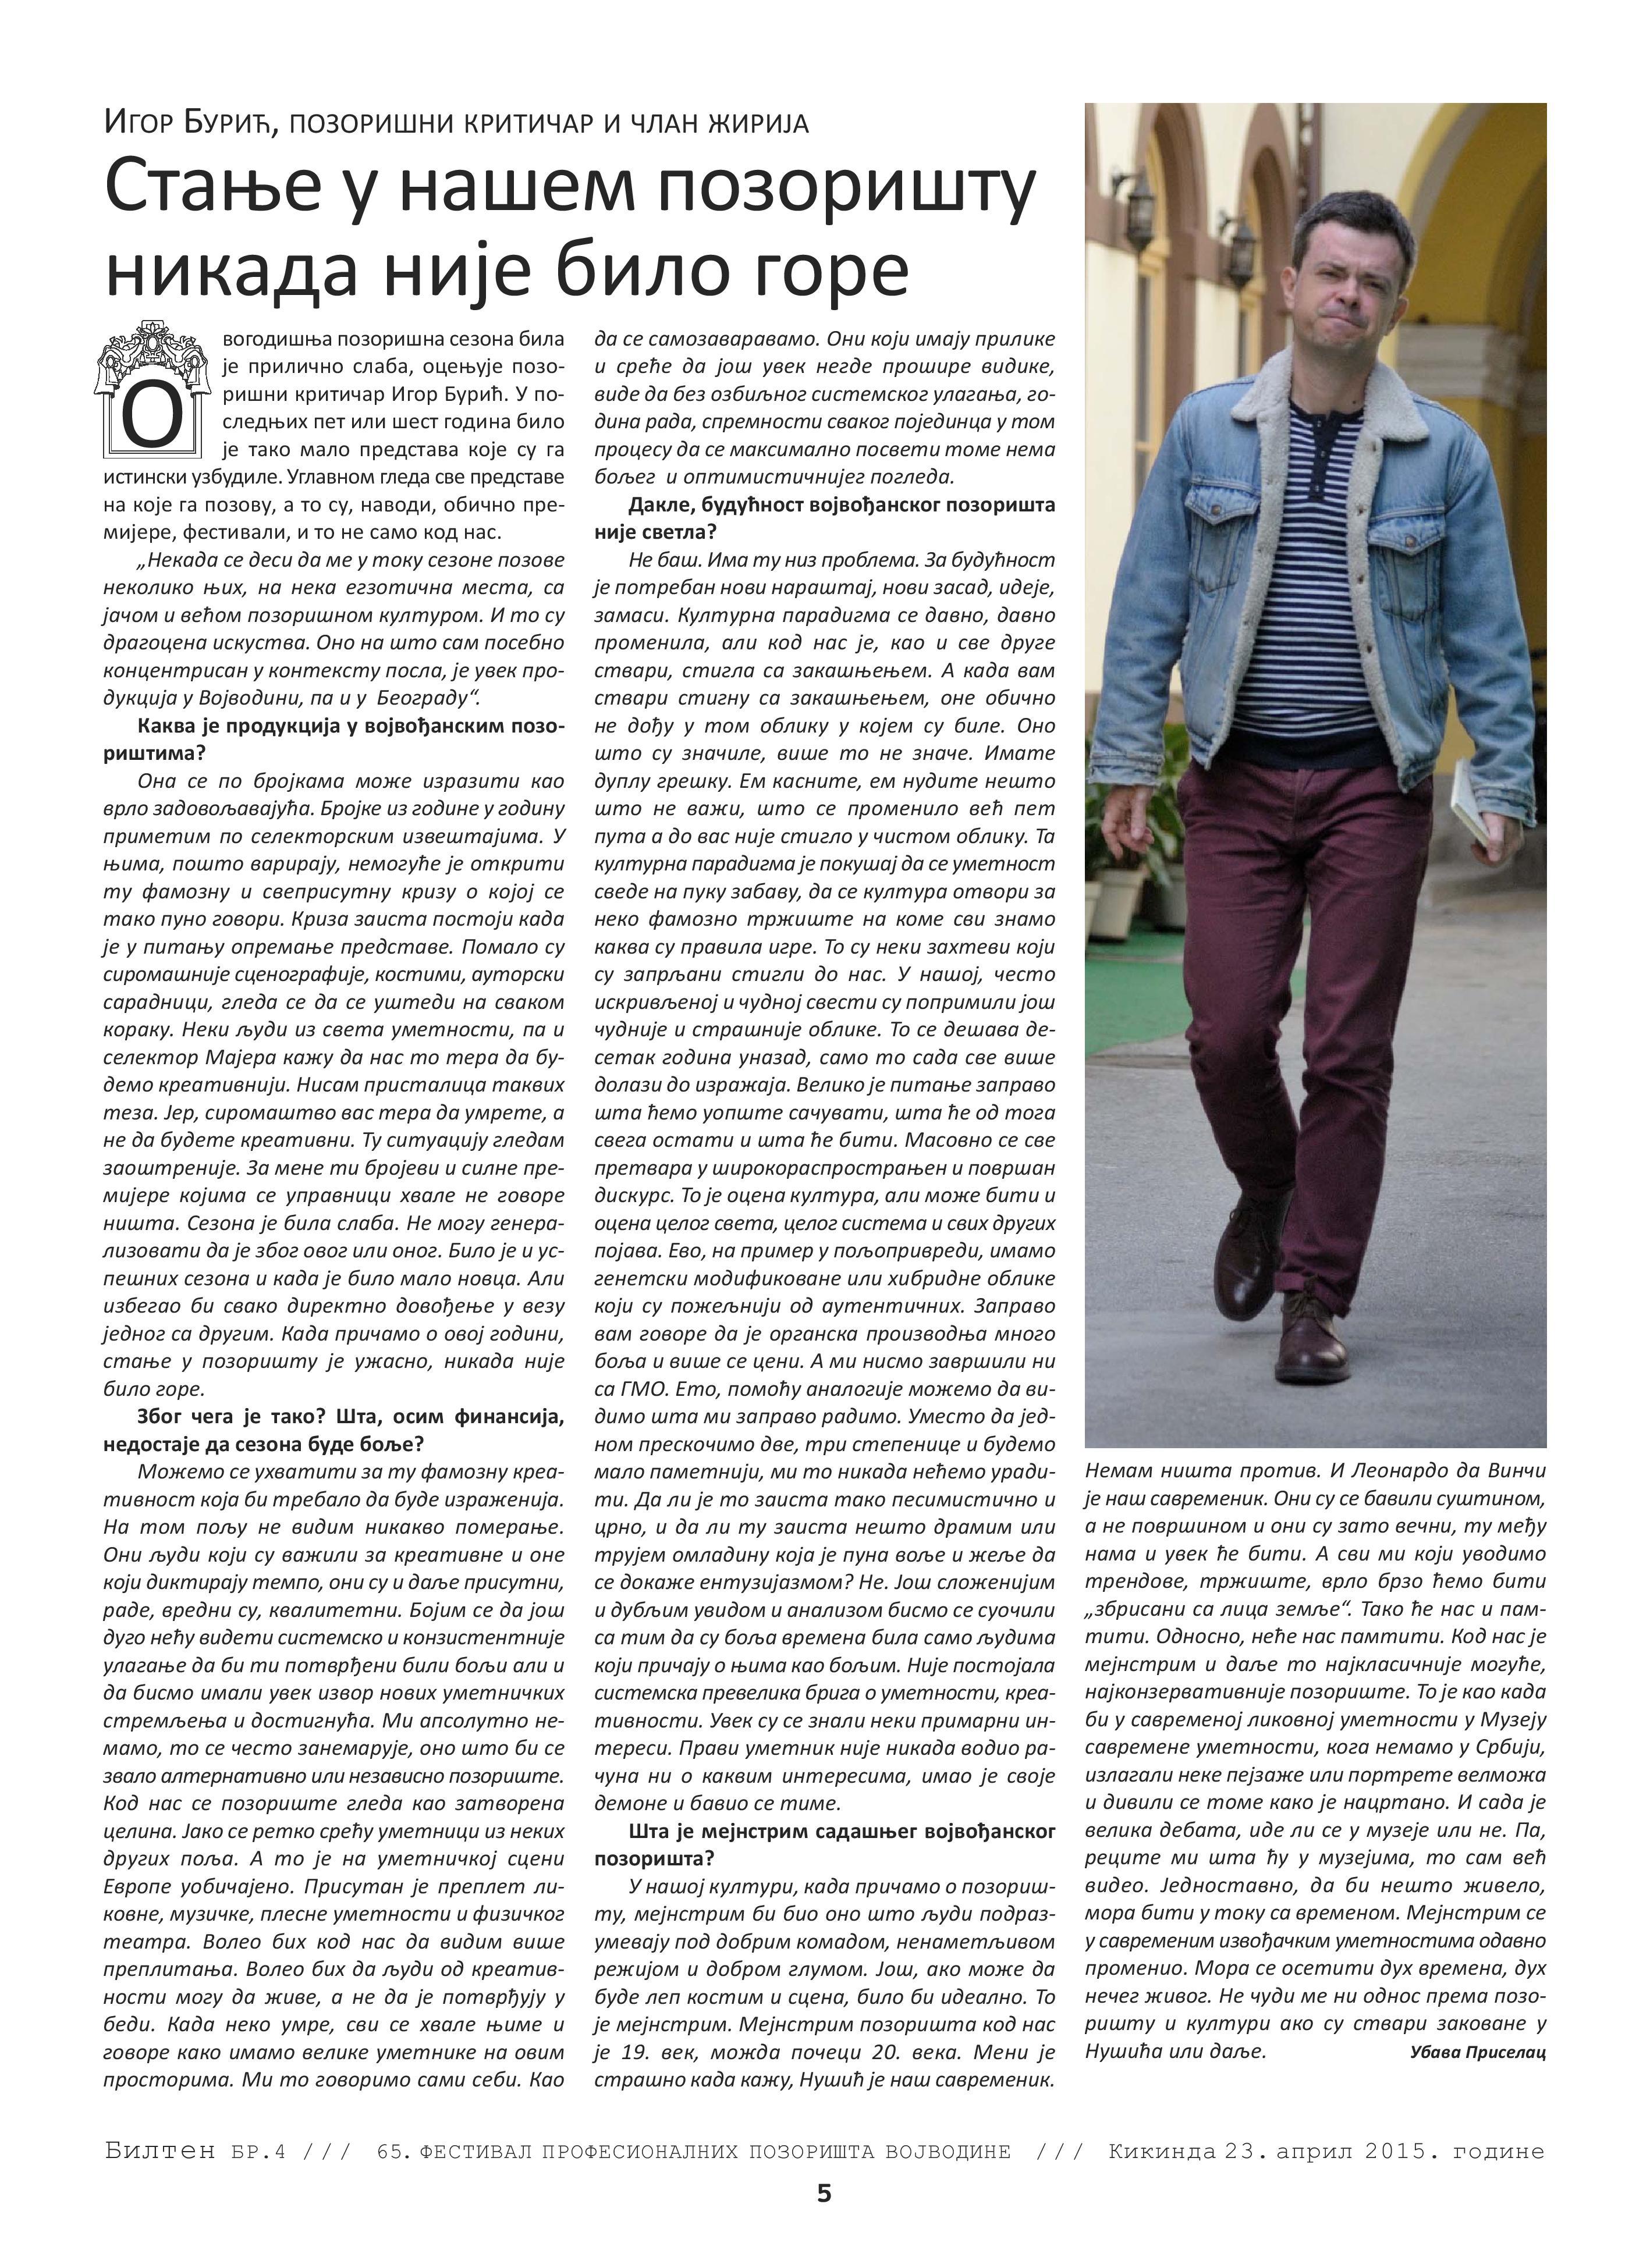 BILTEN_04_23 april_Copy of Layout 2-page-005